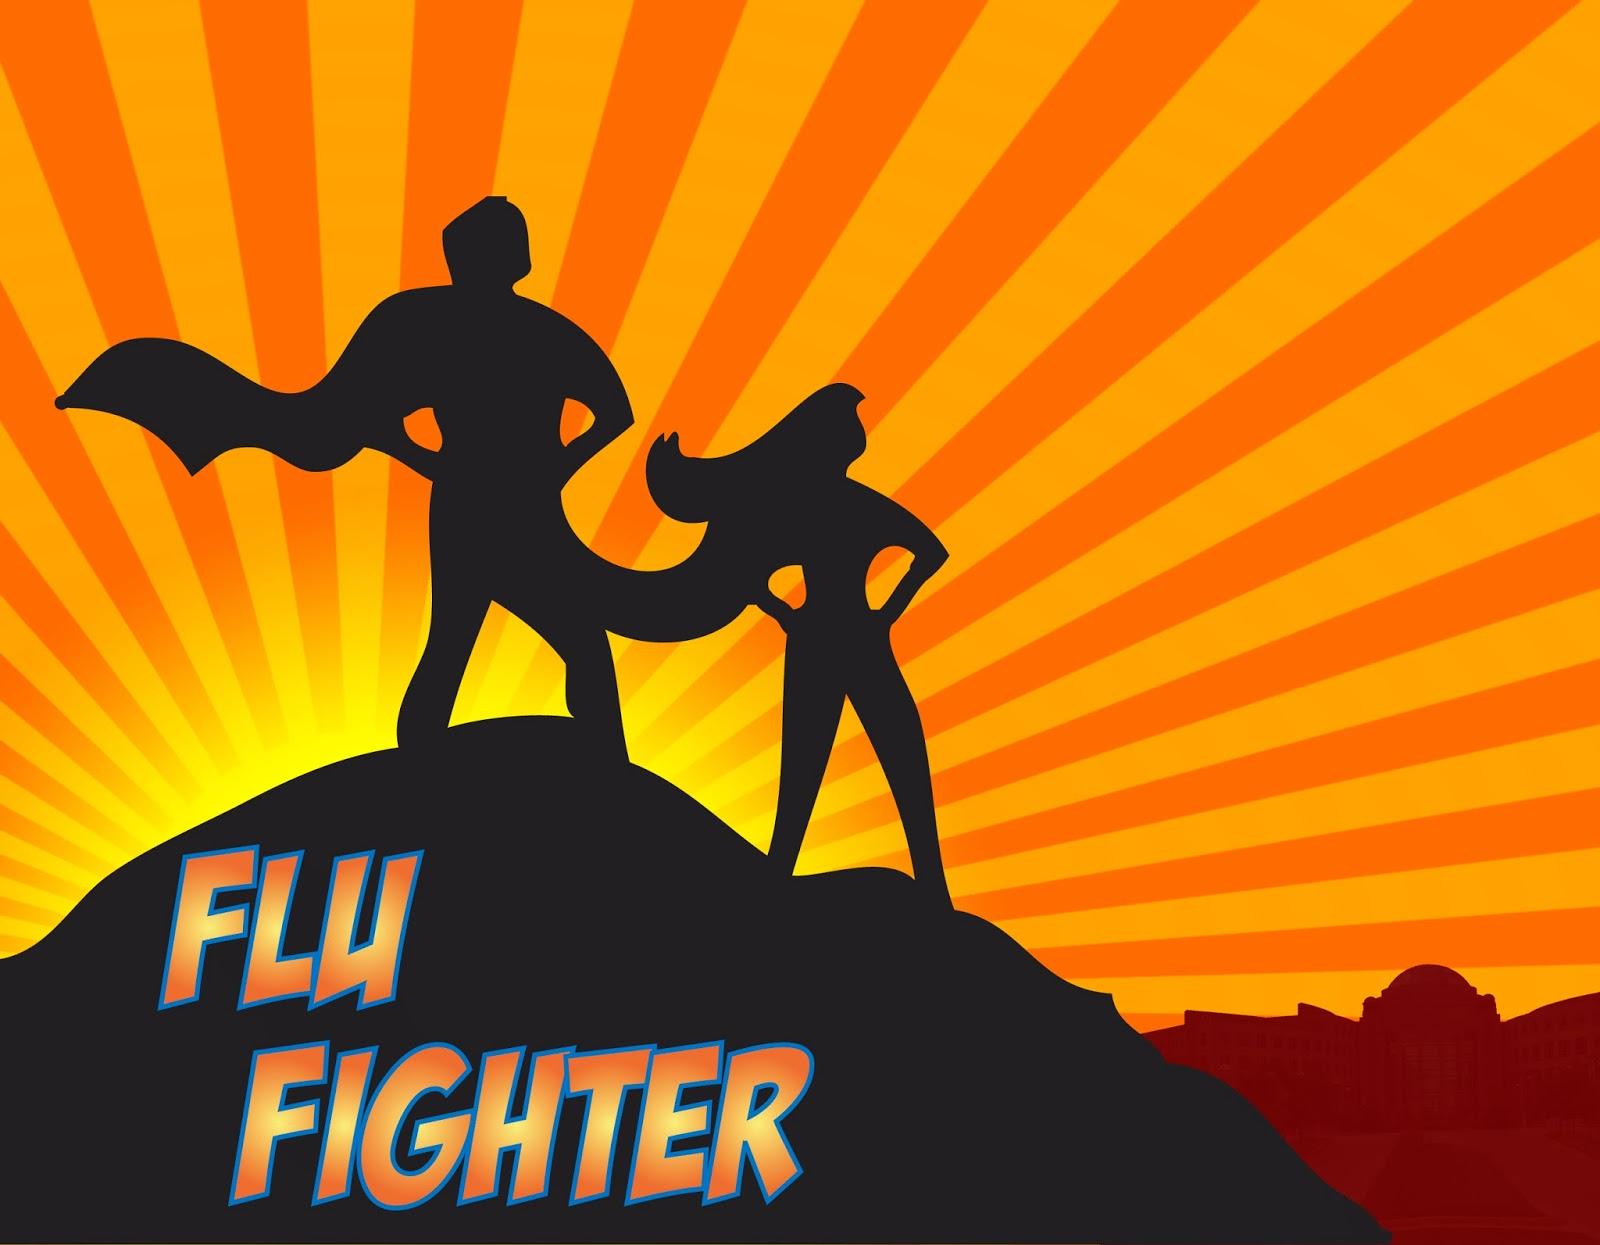 Flu Shot 2013 Should get a flu shot,